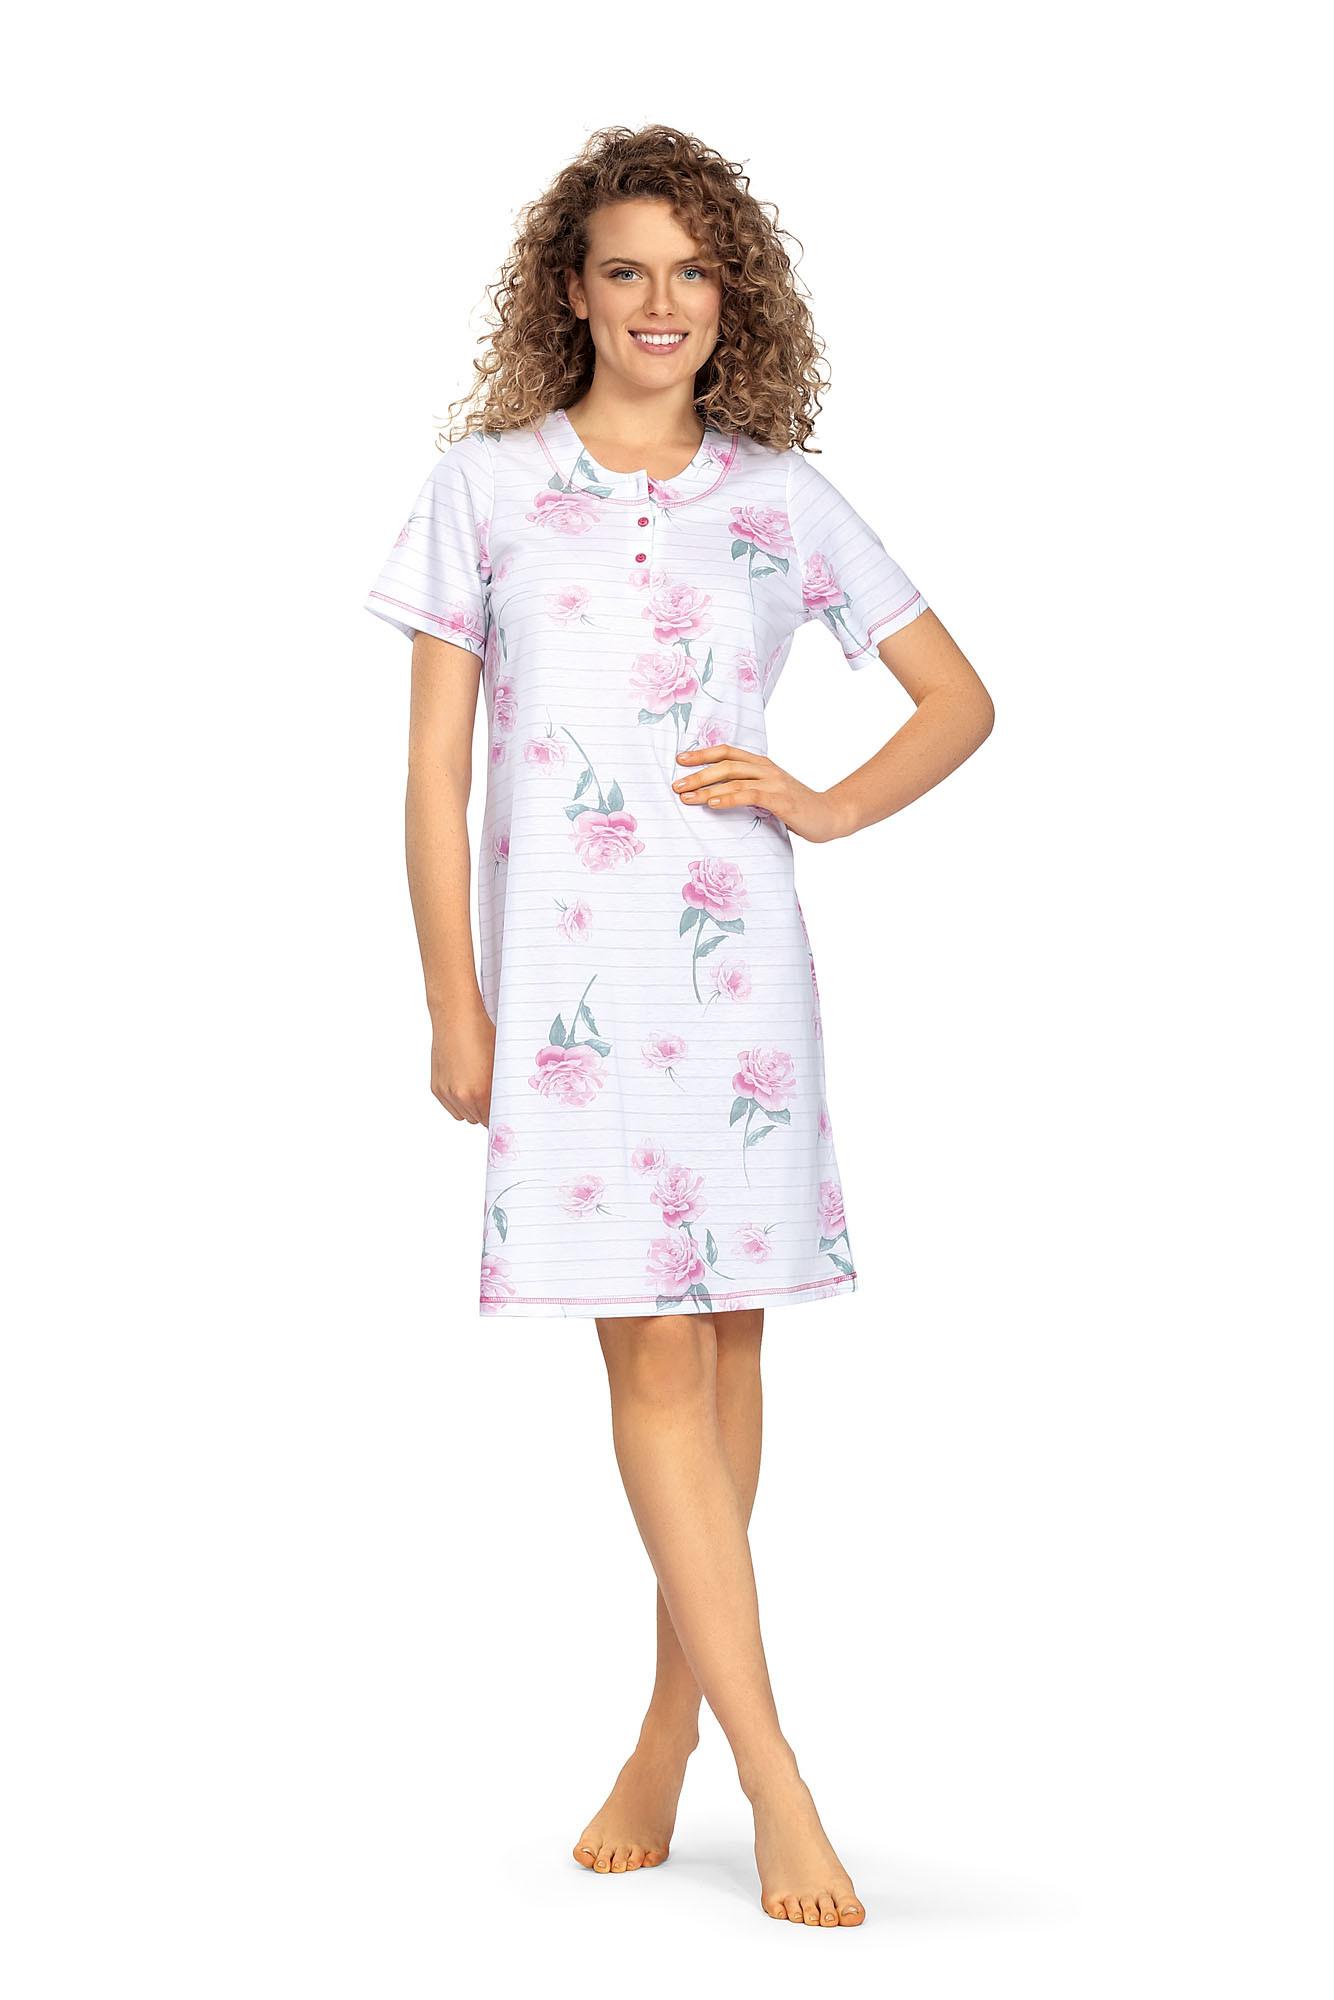 Comtessa Ascafa Damen Nachthemd Knopfleiste kurzer Arm weiß Rosenmuster 100% Baumwolle